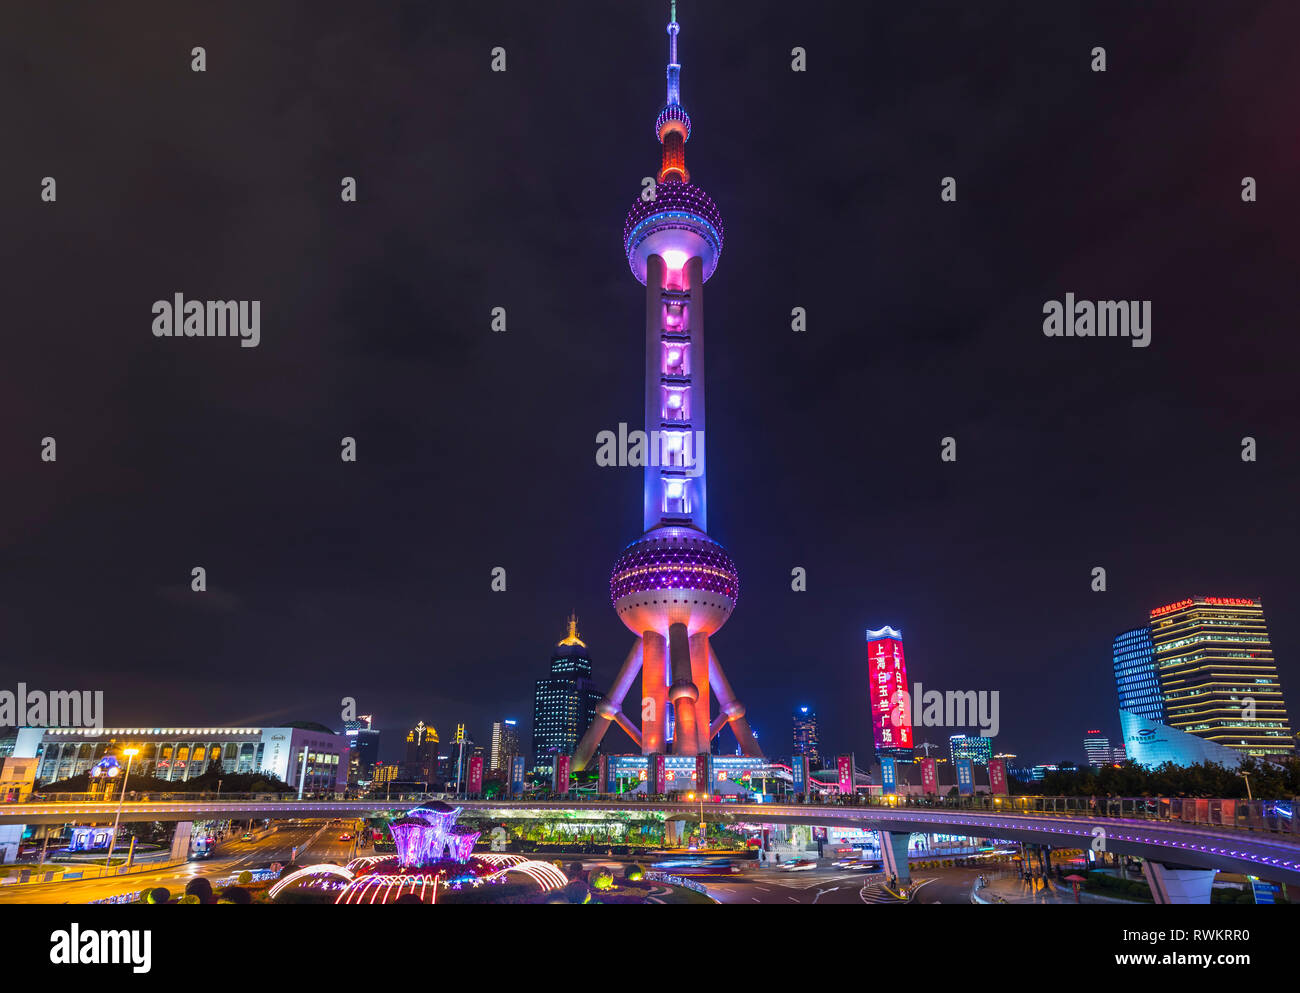 La Oriental Pearl Tower de noche, Shanghai, China Foto de stock